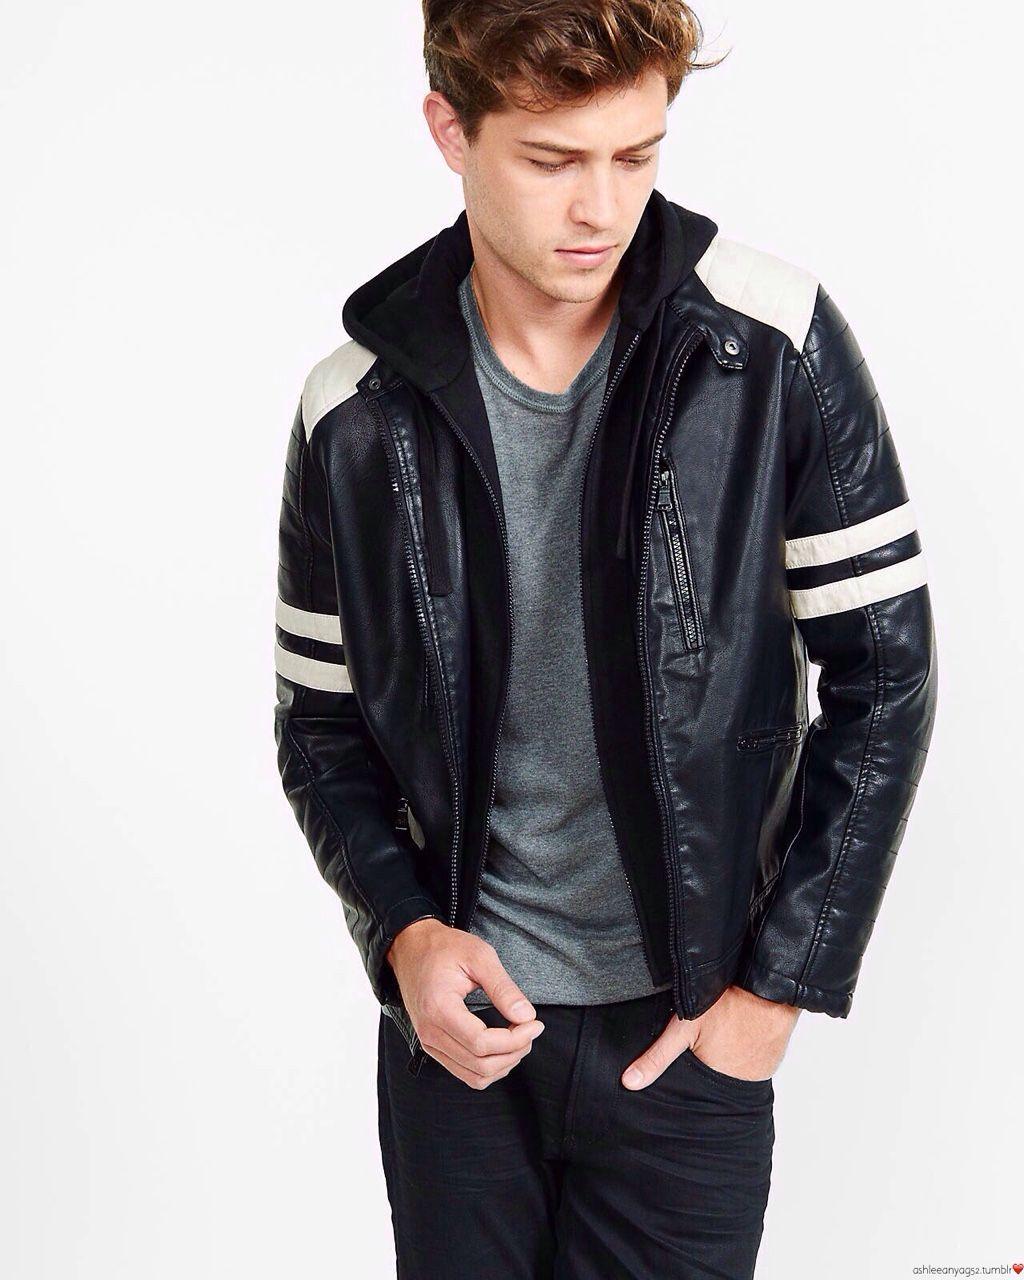 Francisco Lachowski Obsession Photo Leather Jacket Men Men S Streetwear Mens Outfits [ 1280 x 1024 Pixel ]